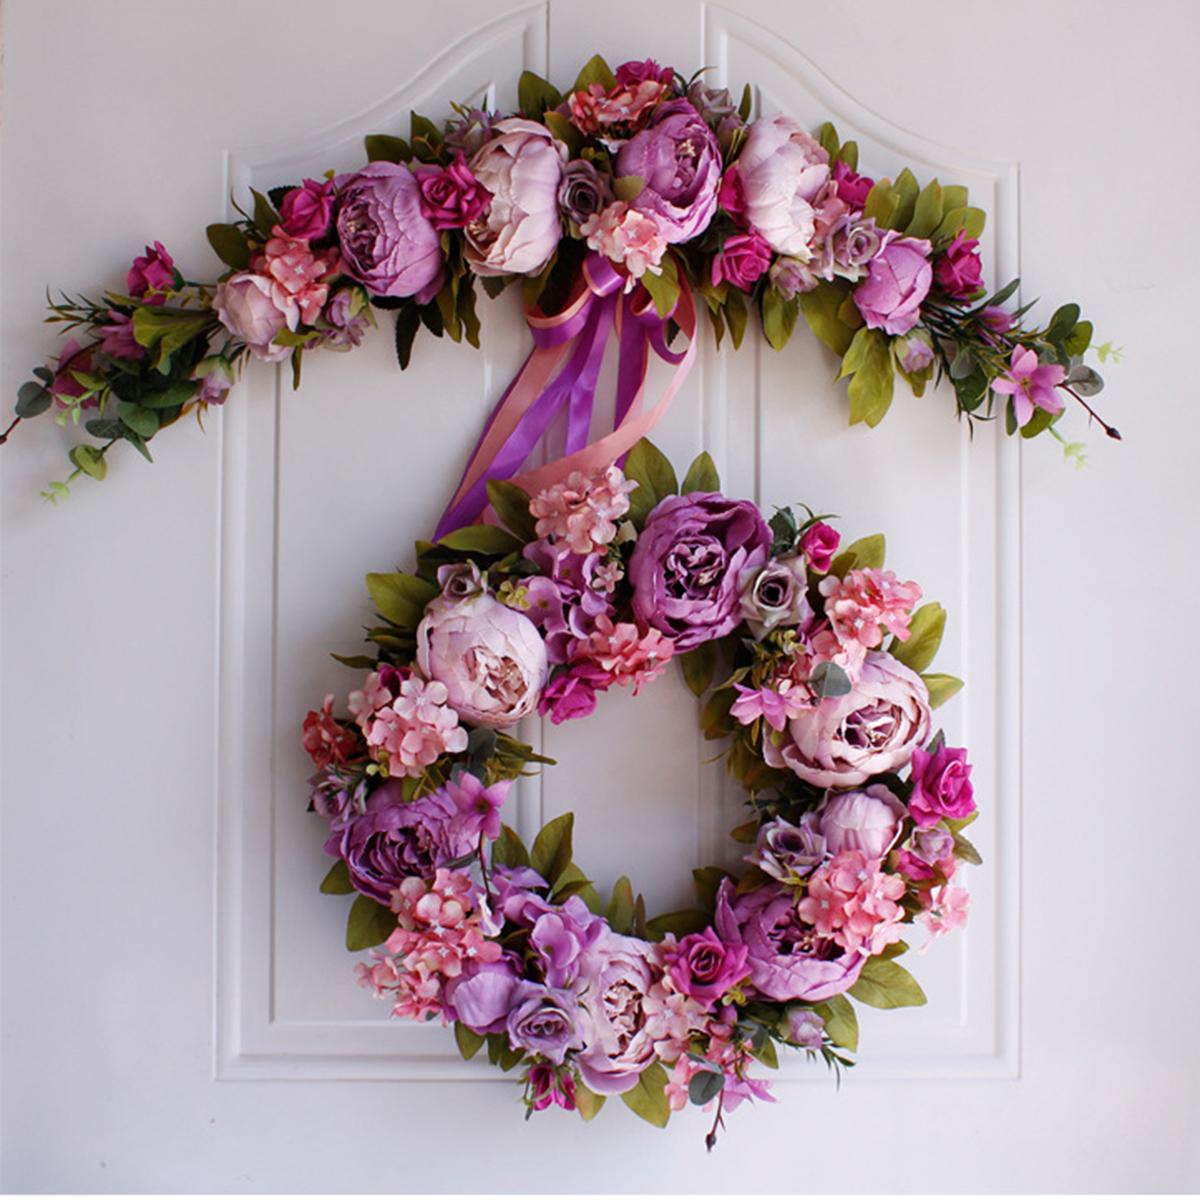 Silk Artificial Flowers Peony Bouquet Garland Wreath Wedding Door Wall